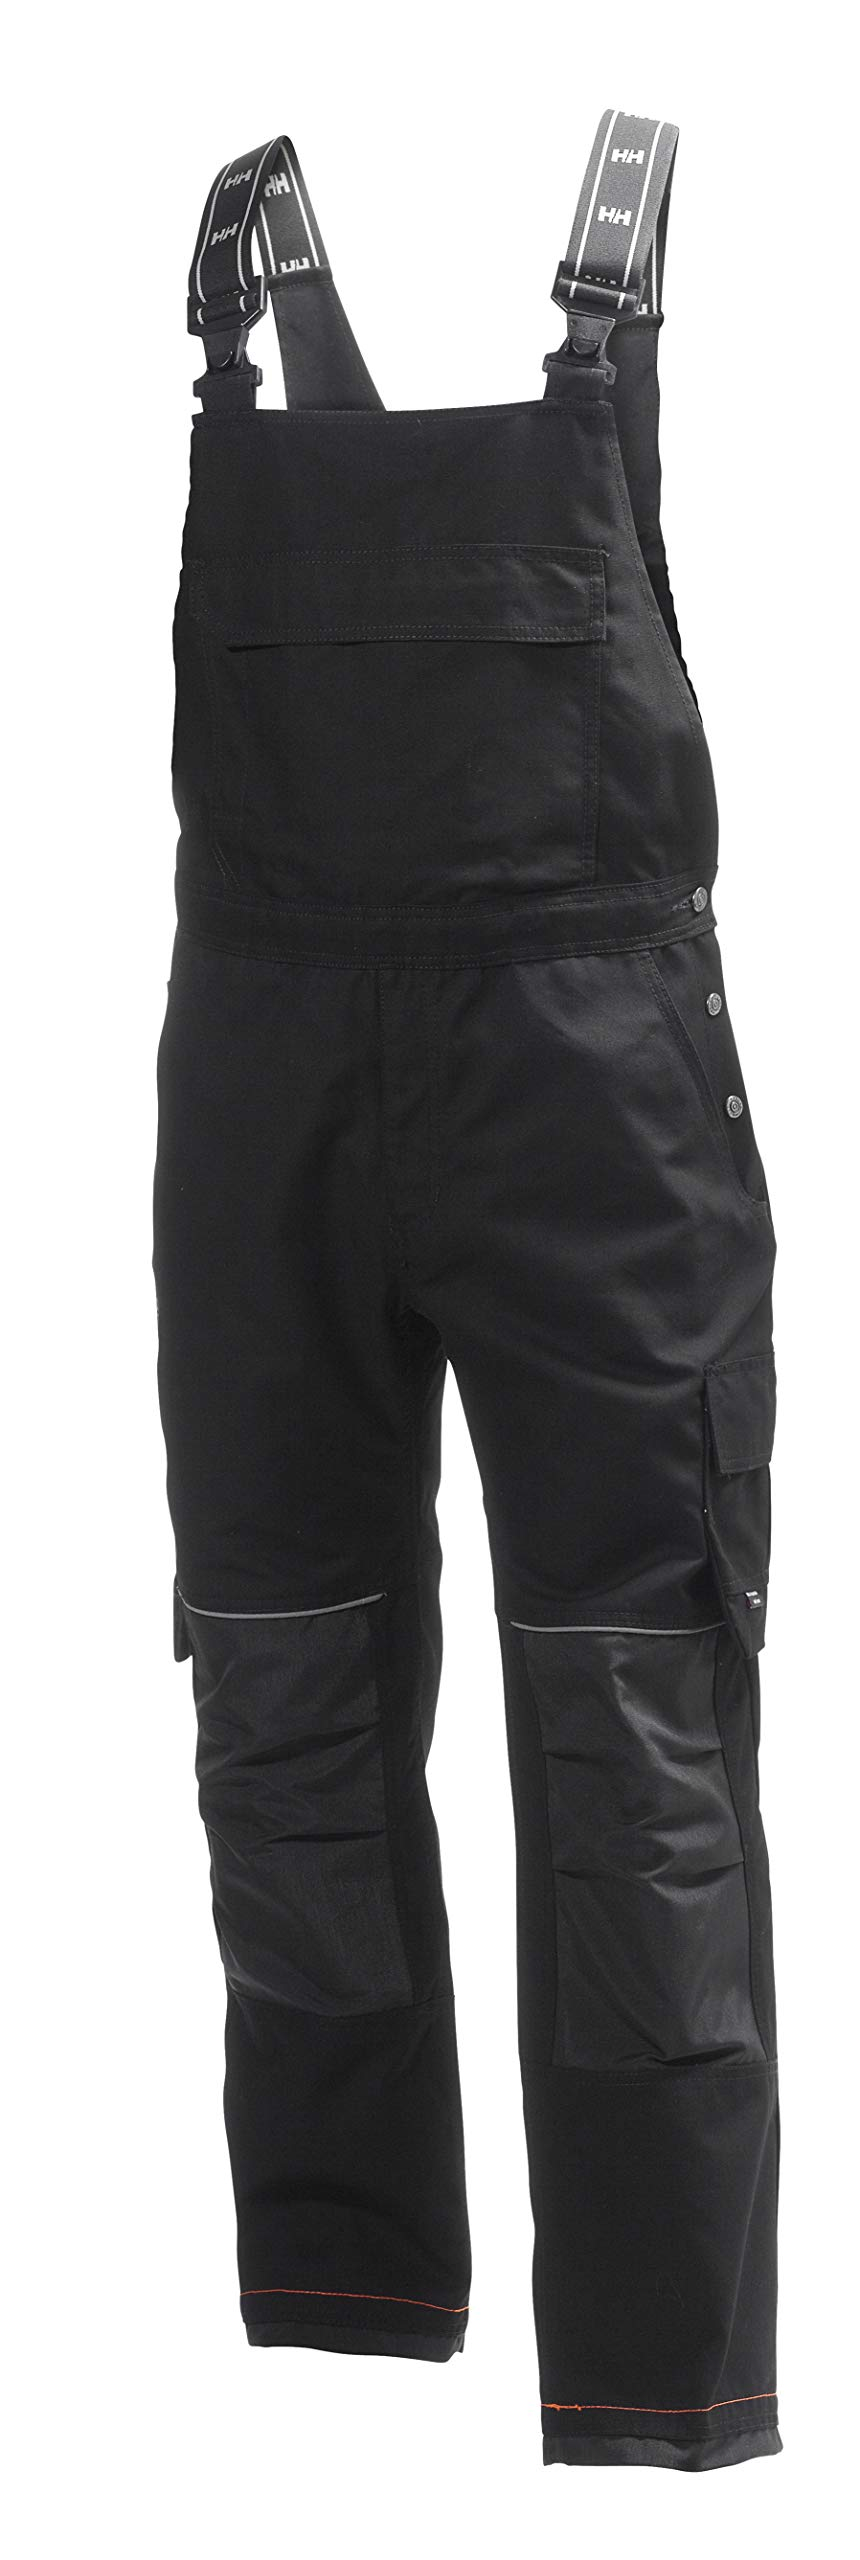 Helly Hansen Work Wear Men's Chelsea Construction Work Bib Pants, Black/Charcoal, 50Wx32L